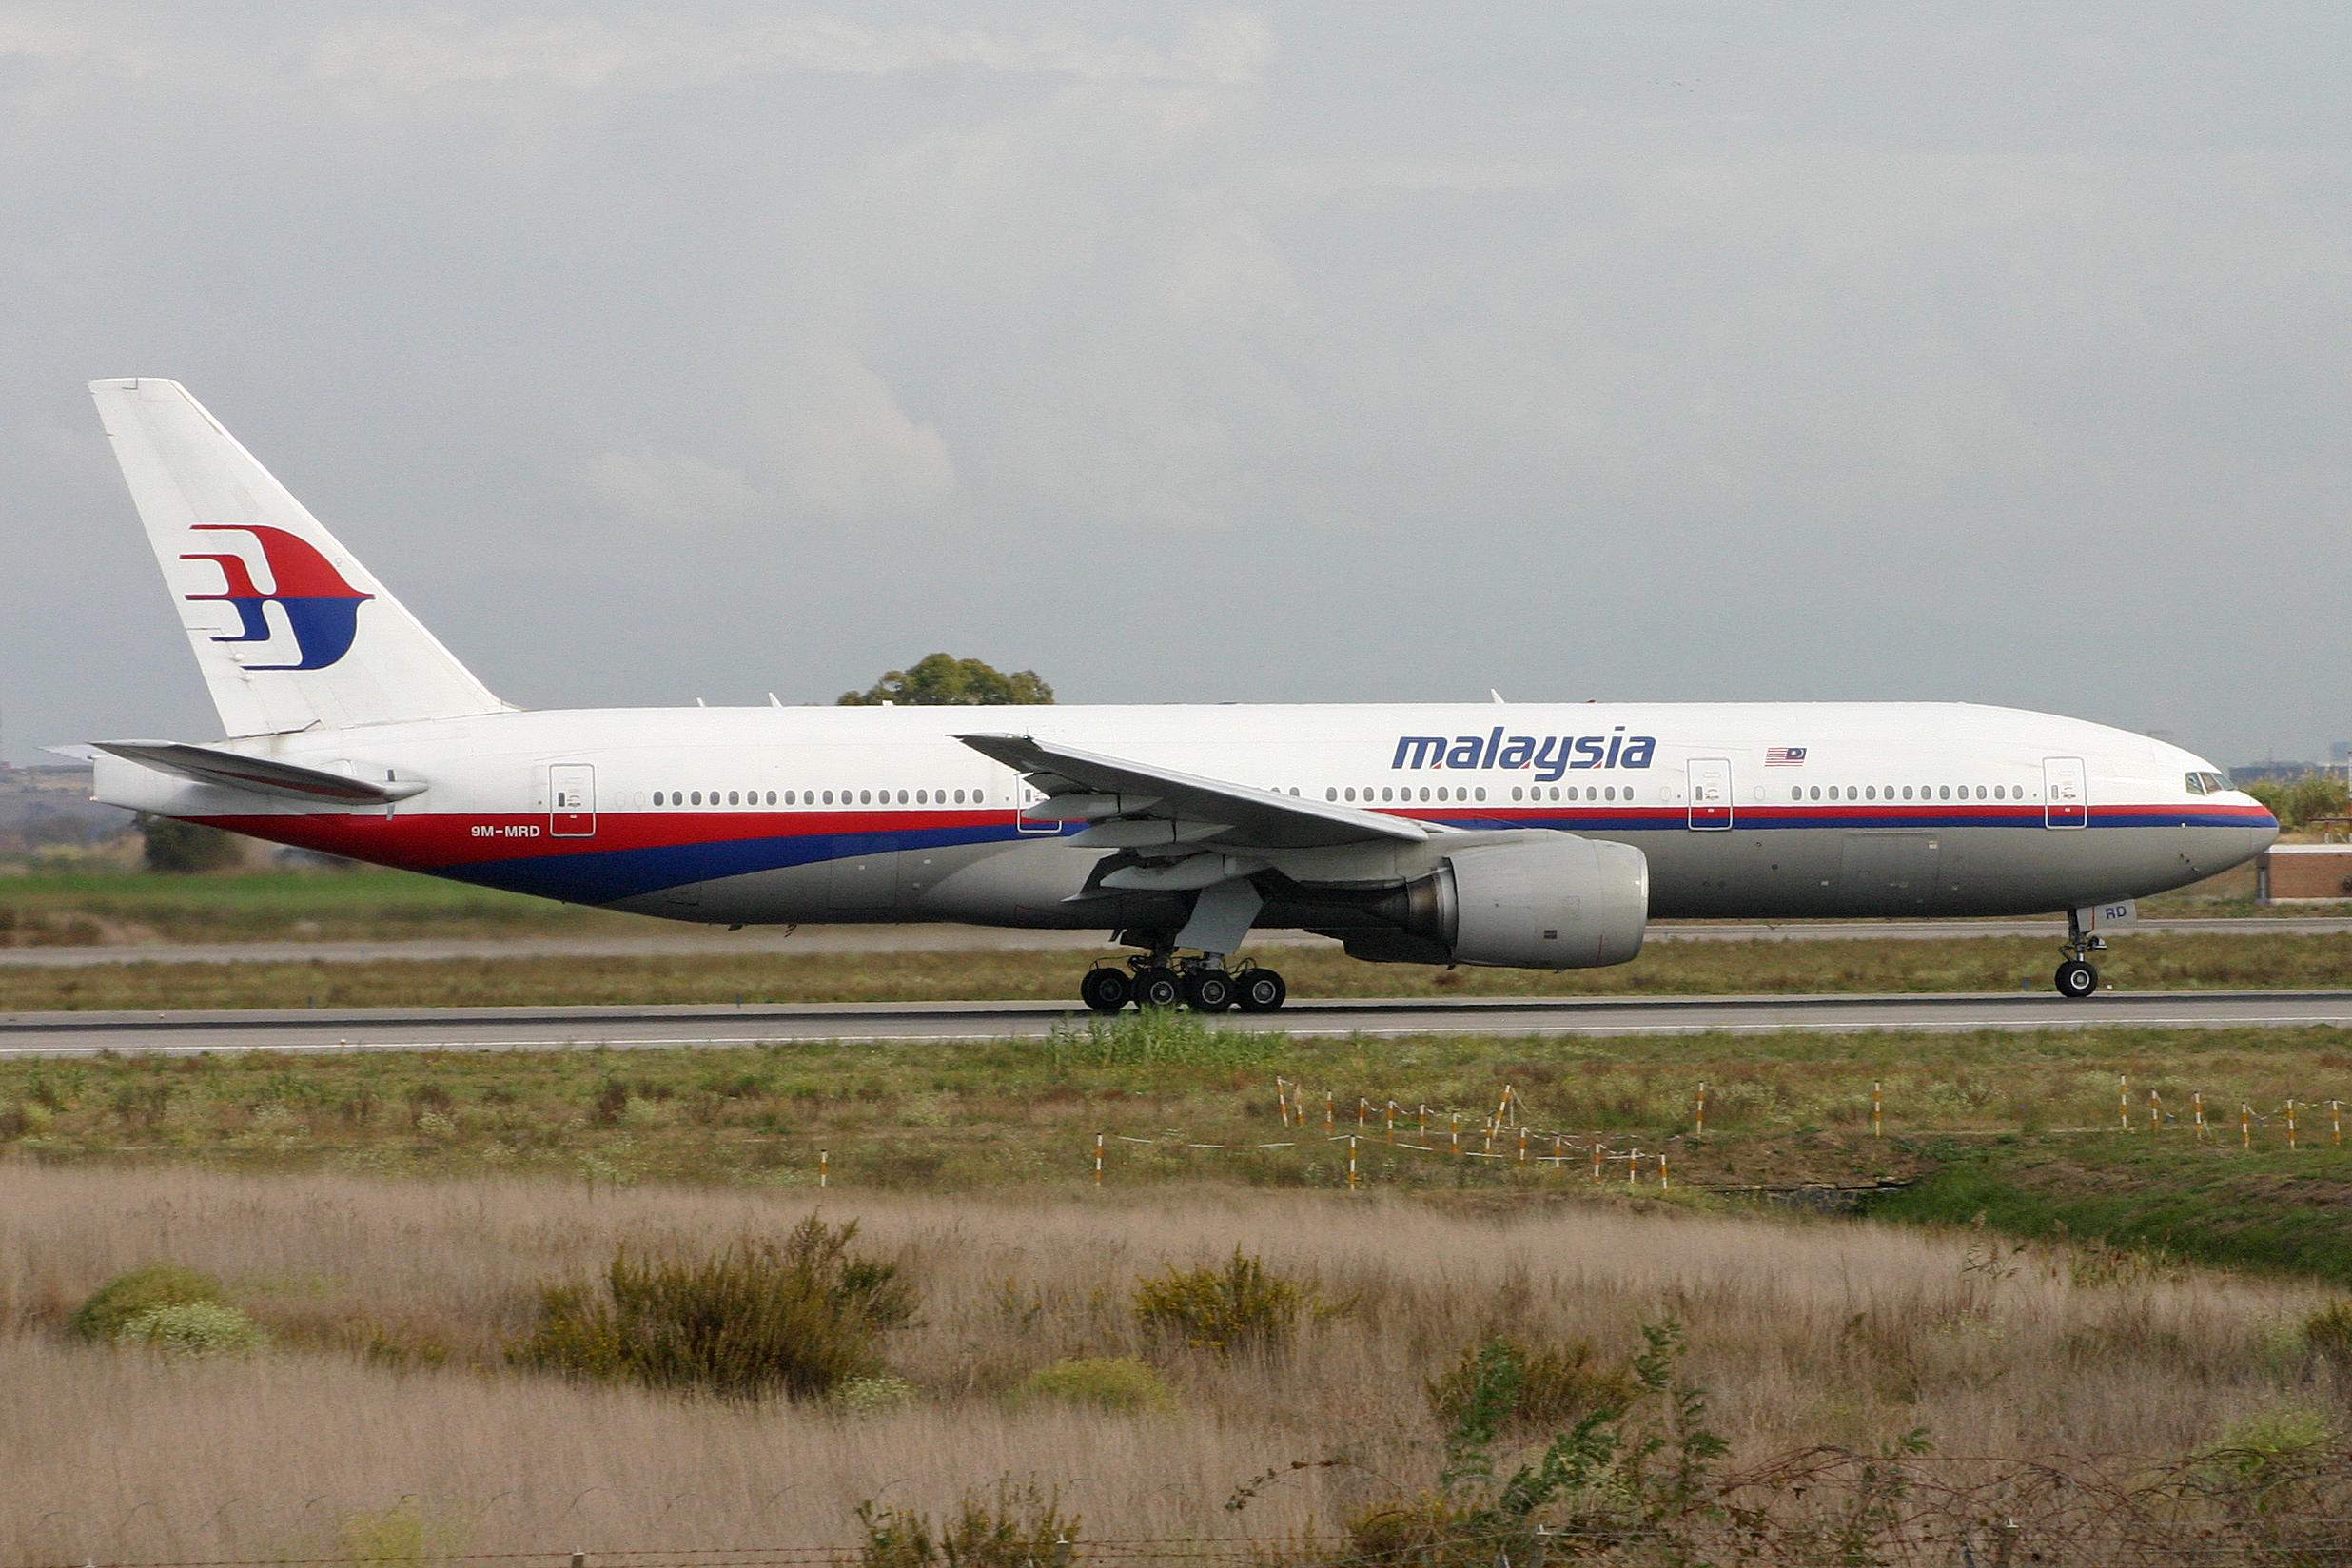 http://upload.wikimedia.org/wikipedia/commons/b/bb/Boeing_777-2H6ER_9M-MRD_Malaysian_(6658133151).jpg